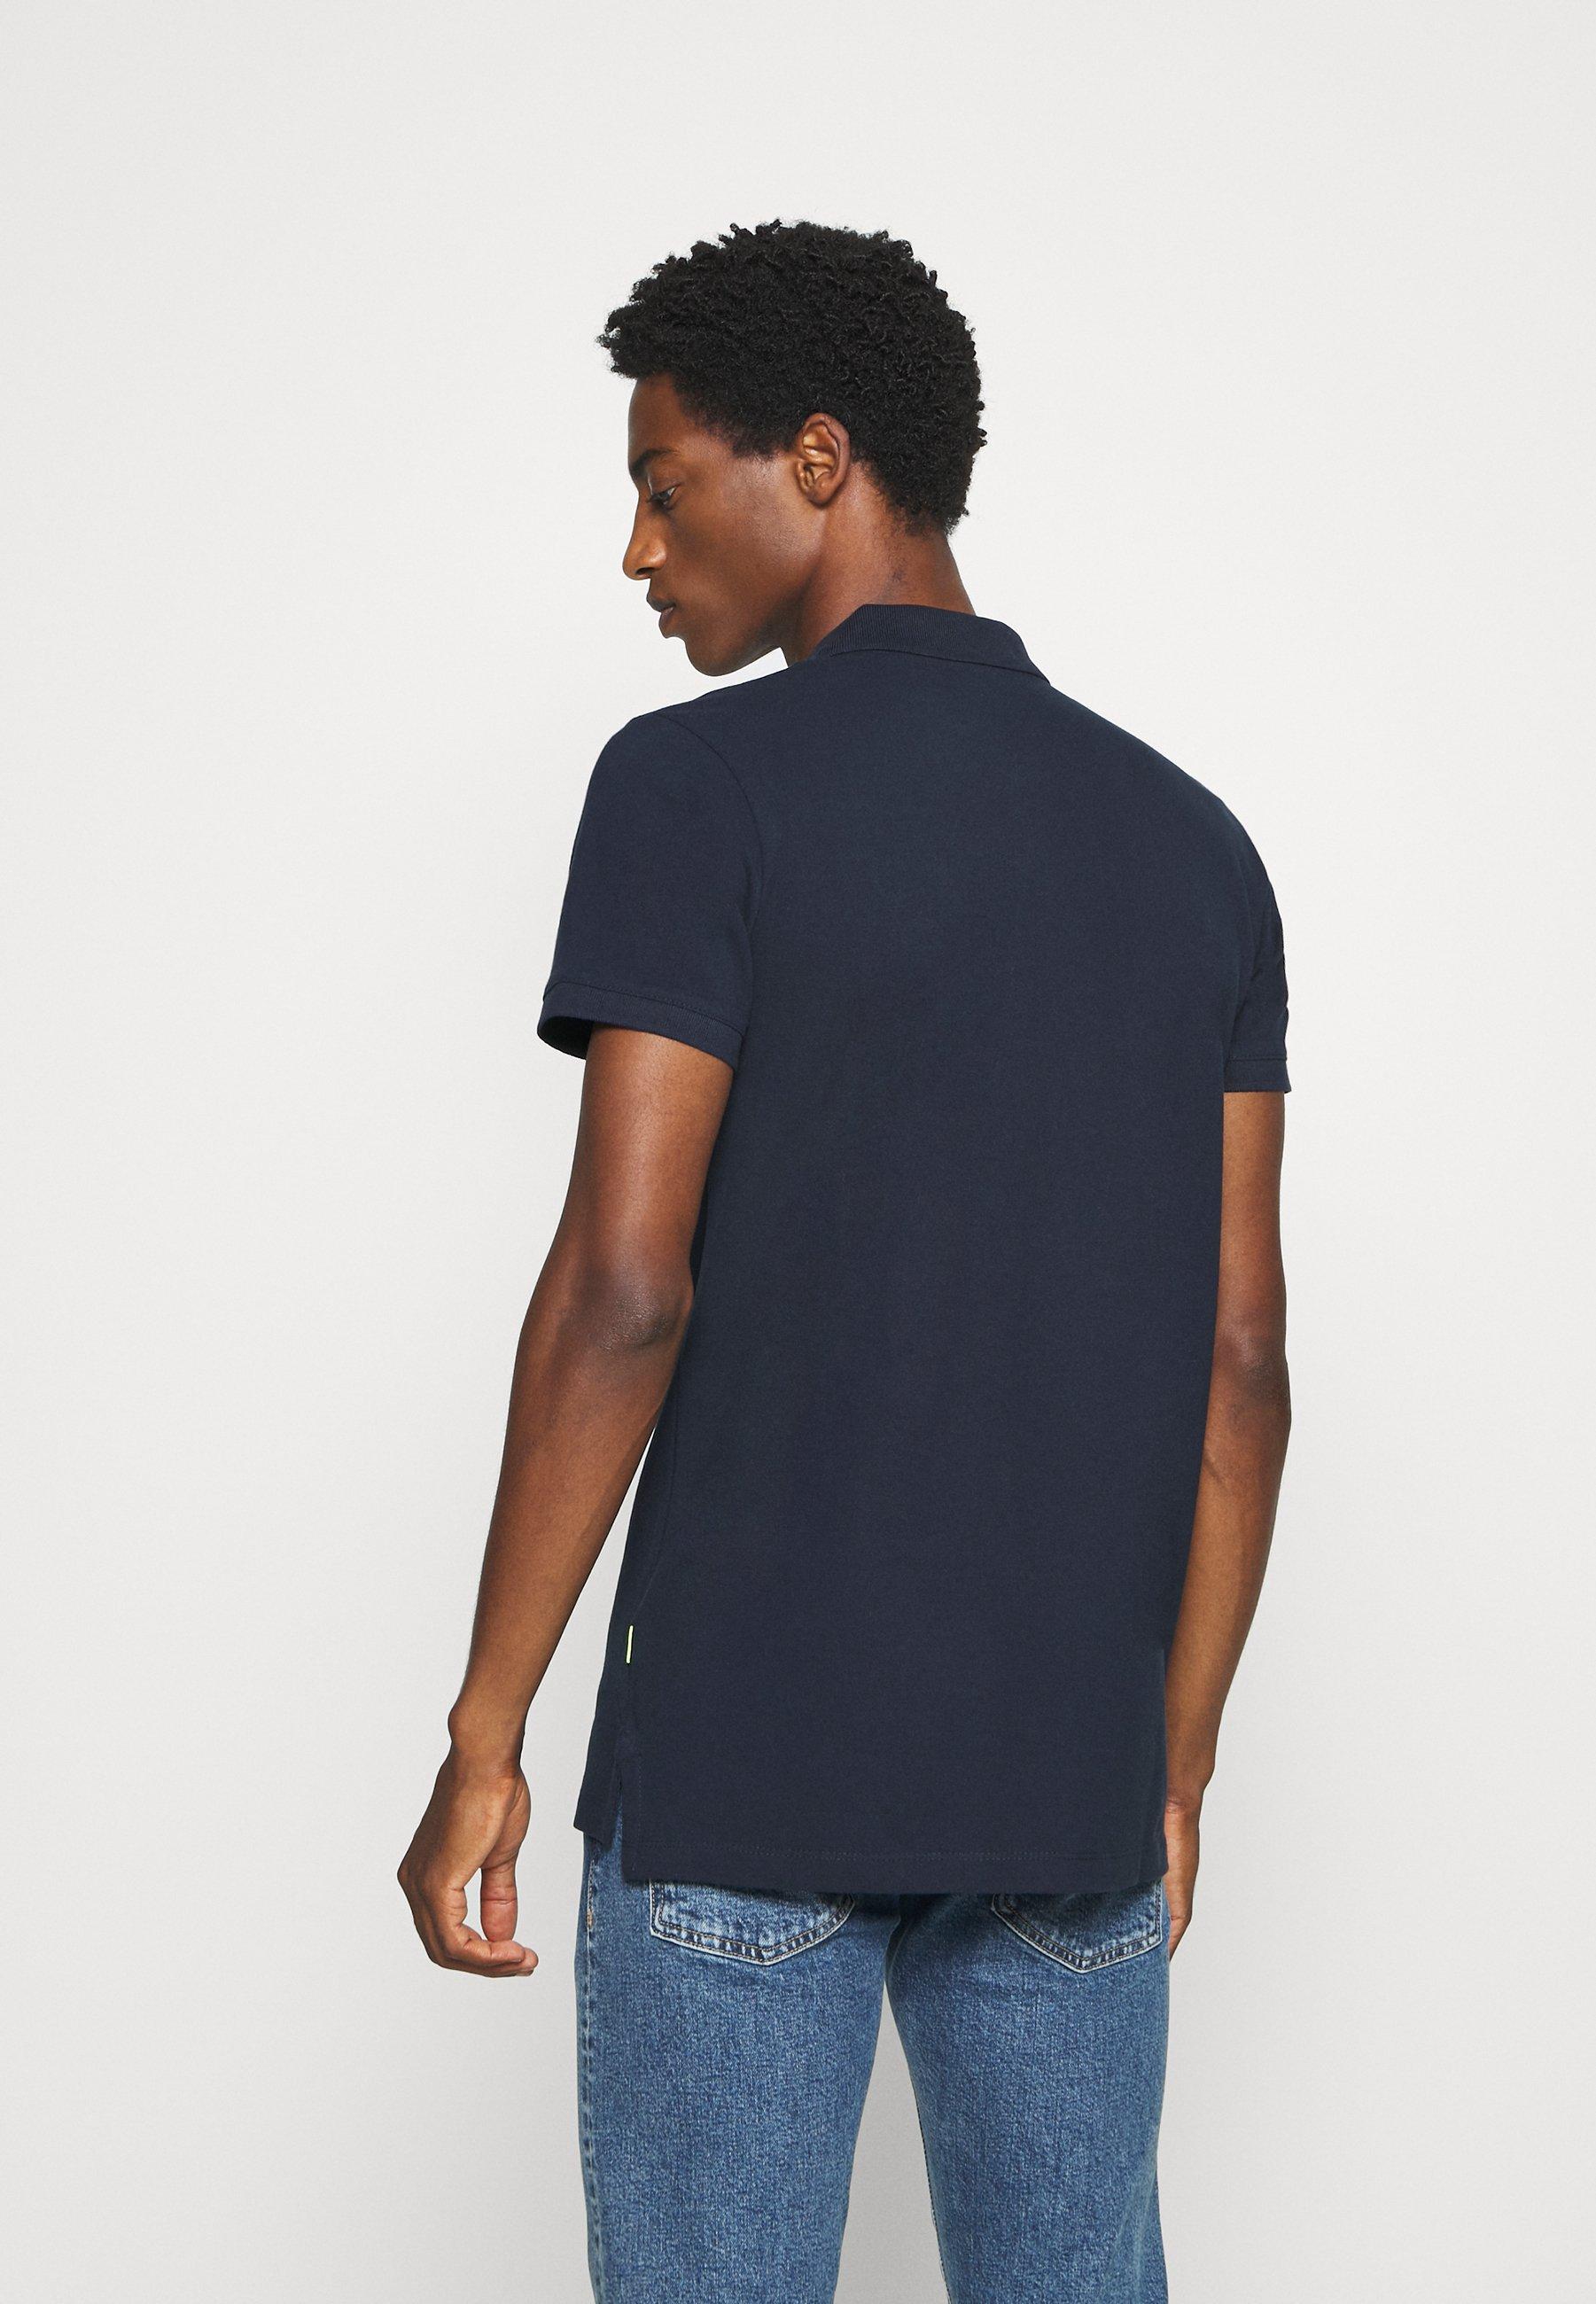 TOM TAILOR DENIM WITH SMALL EMBROIDERY - Polo shirt - sky captain blue 7V102